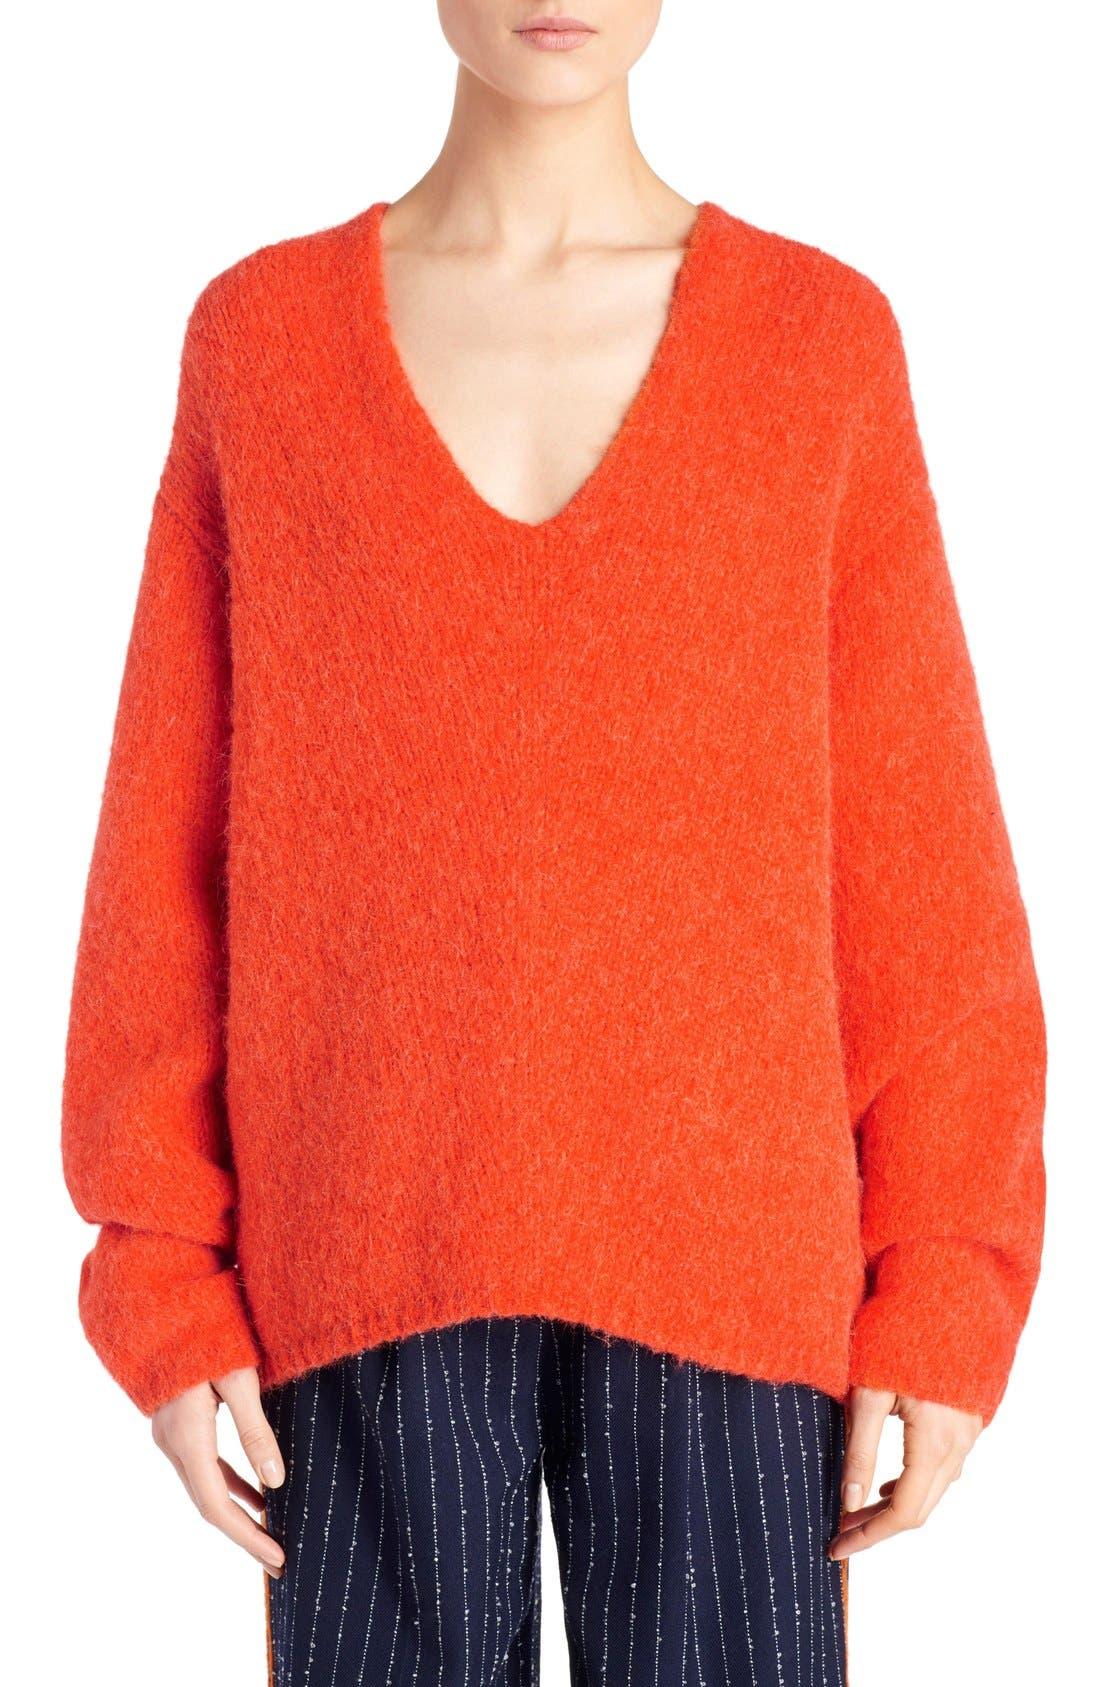 Alternate Image 1 Selected - ACNE Studios 'Deborah' Oversized Alpaca Blend Sweater